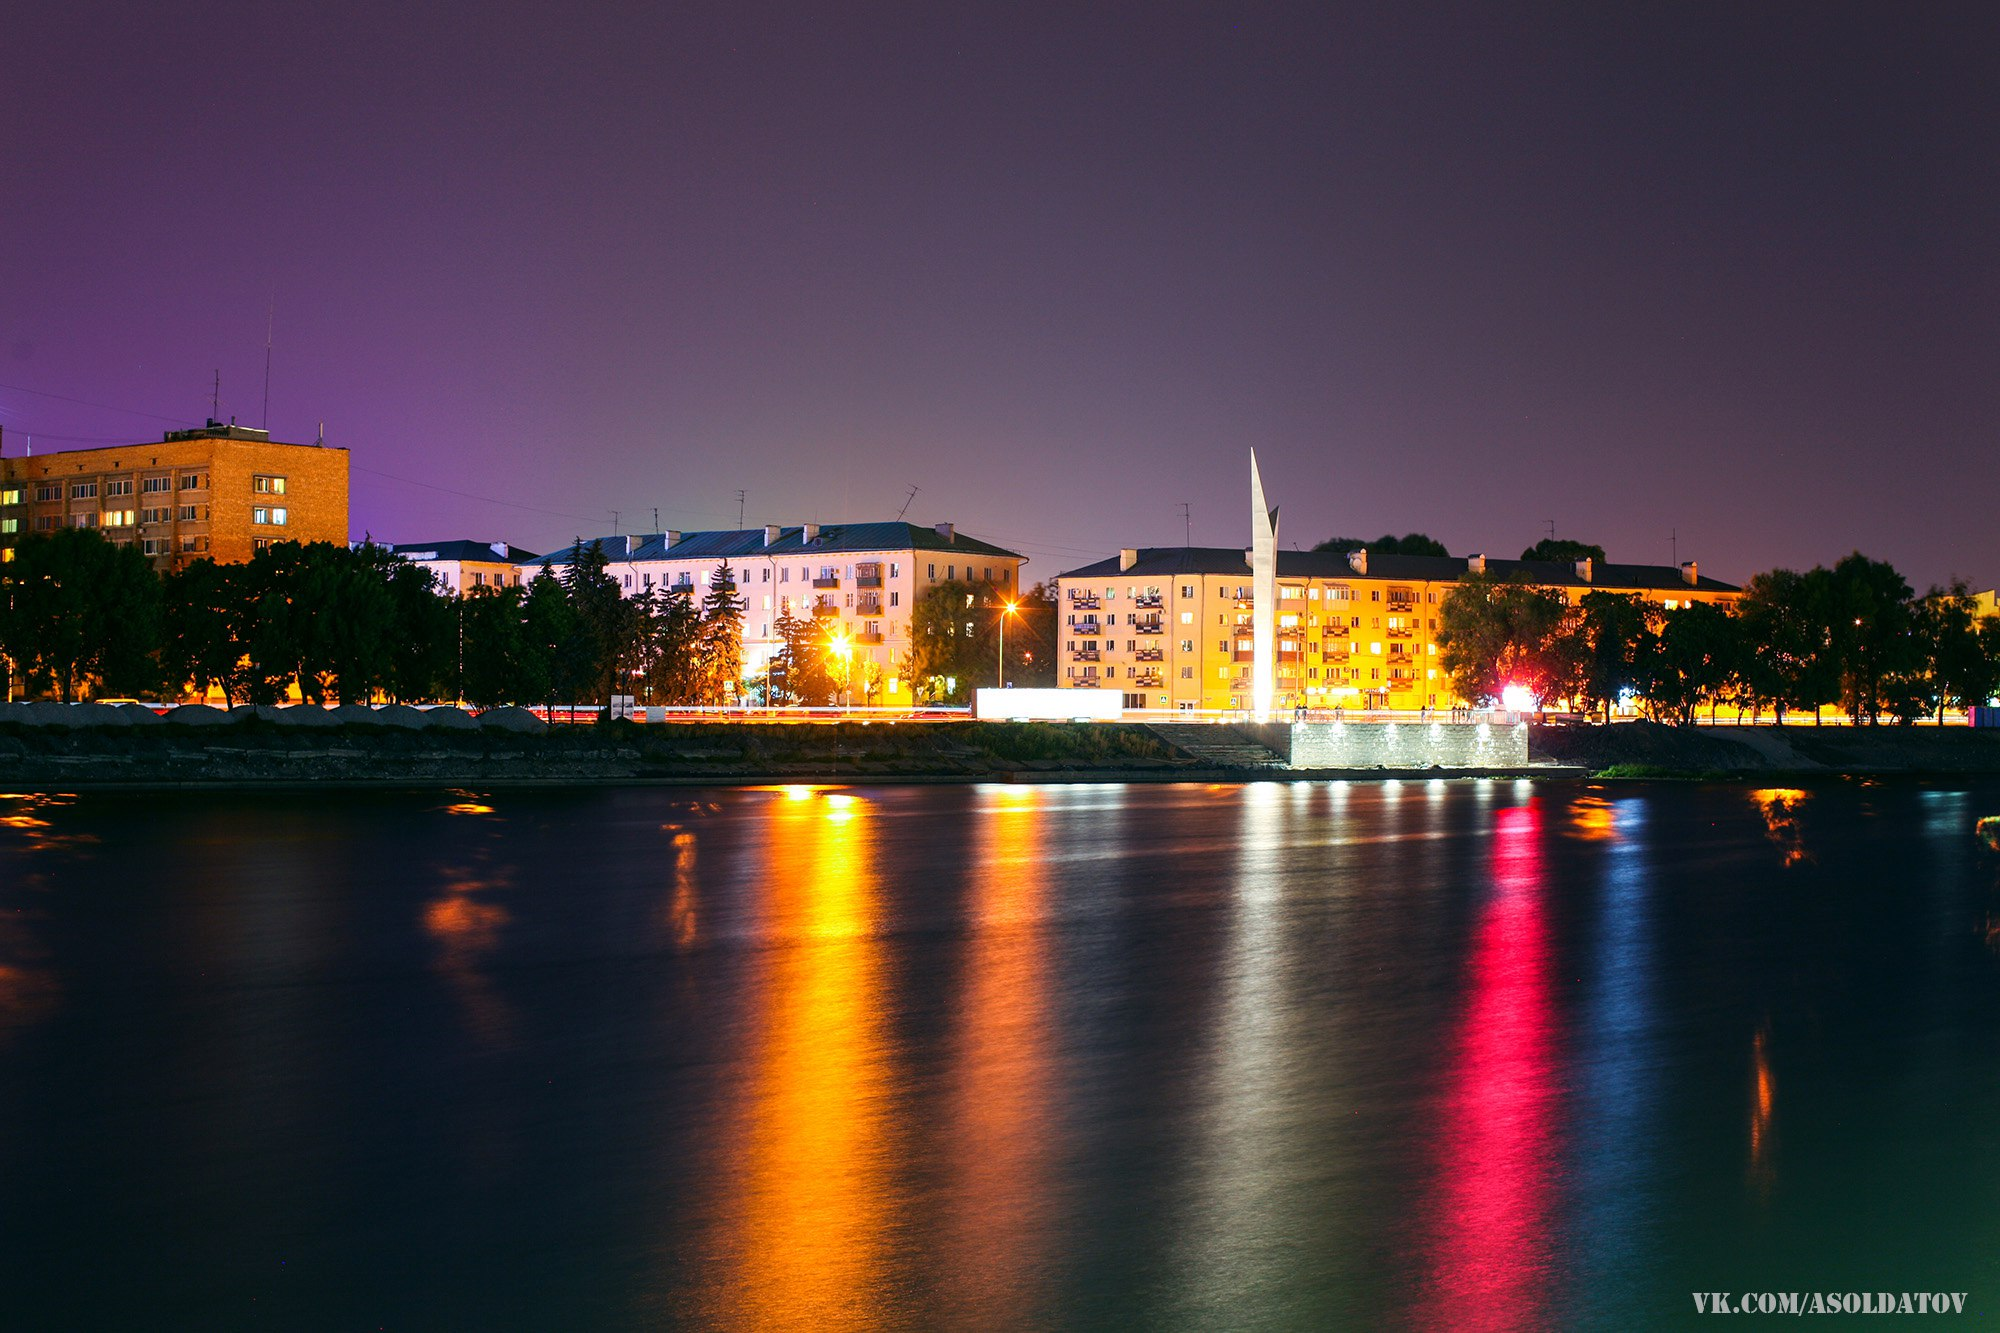 картинки пензы ночь там базировалась флотилия